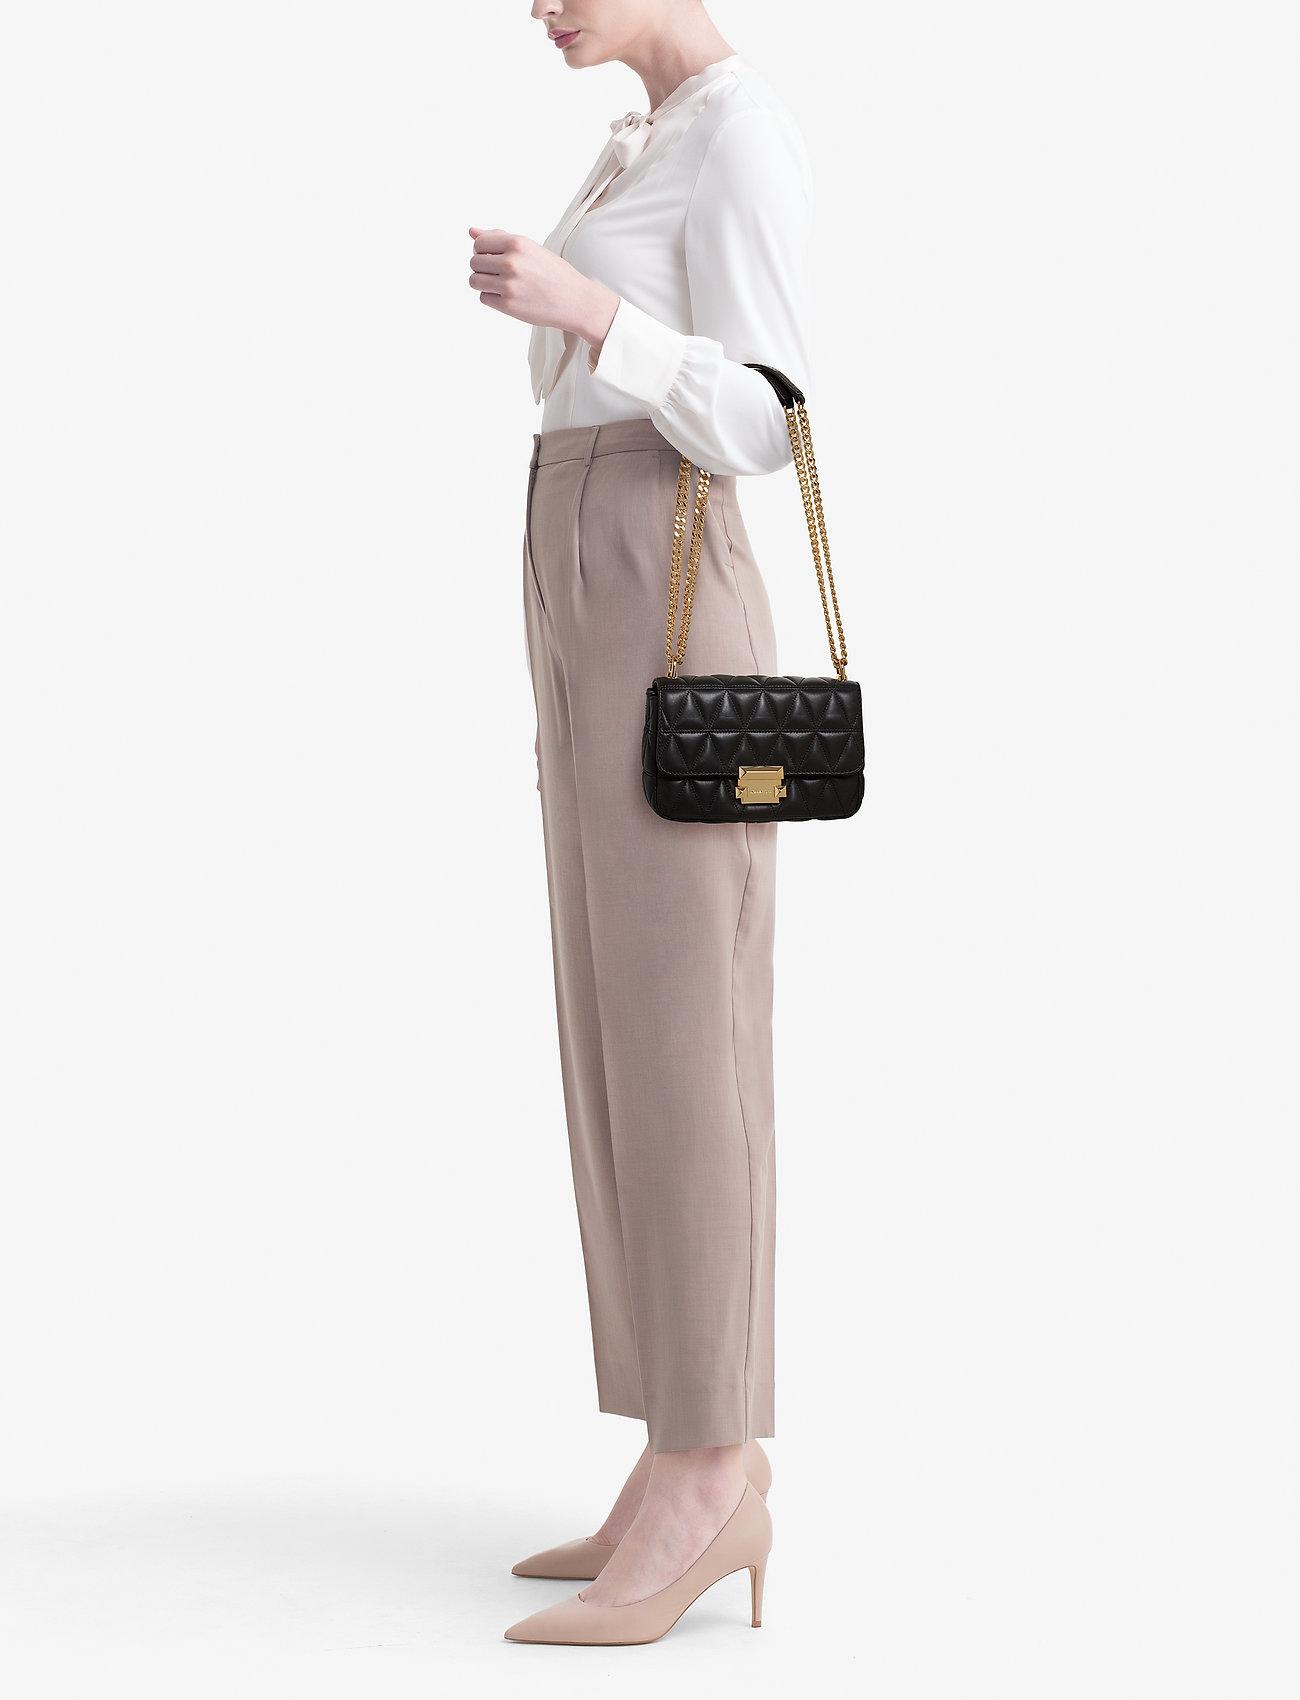 Michael Kors Bags SM CHAIN SHLDR - BLACK